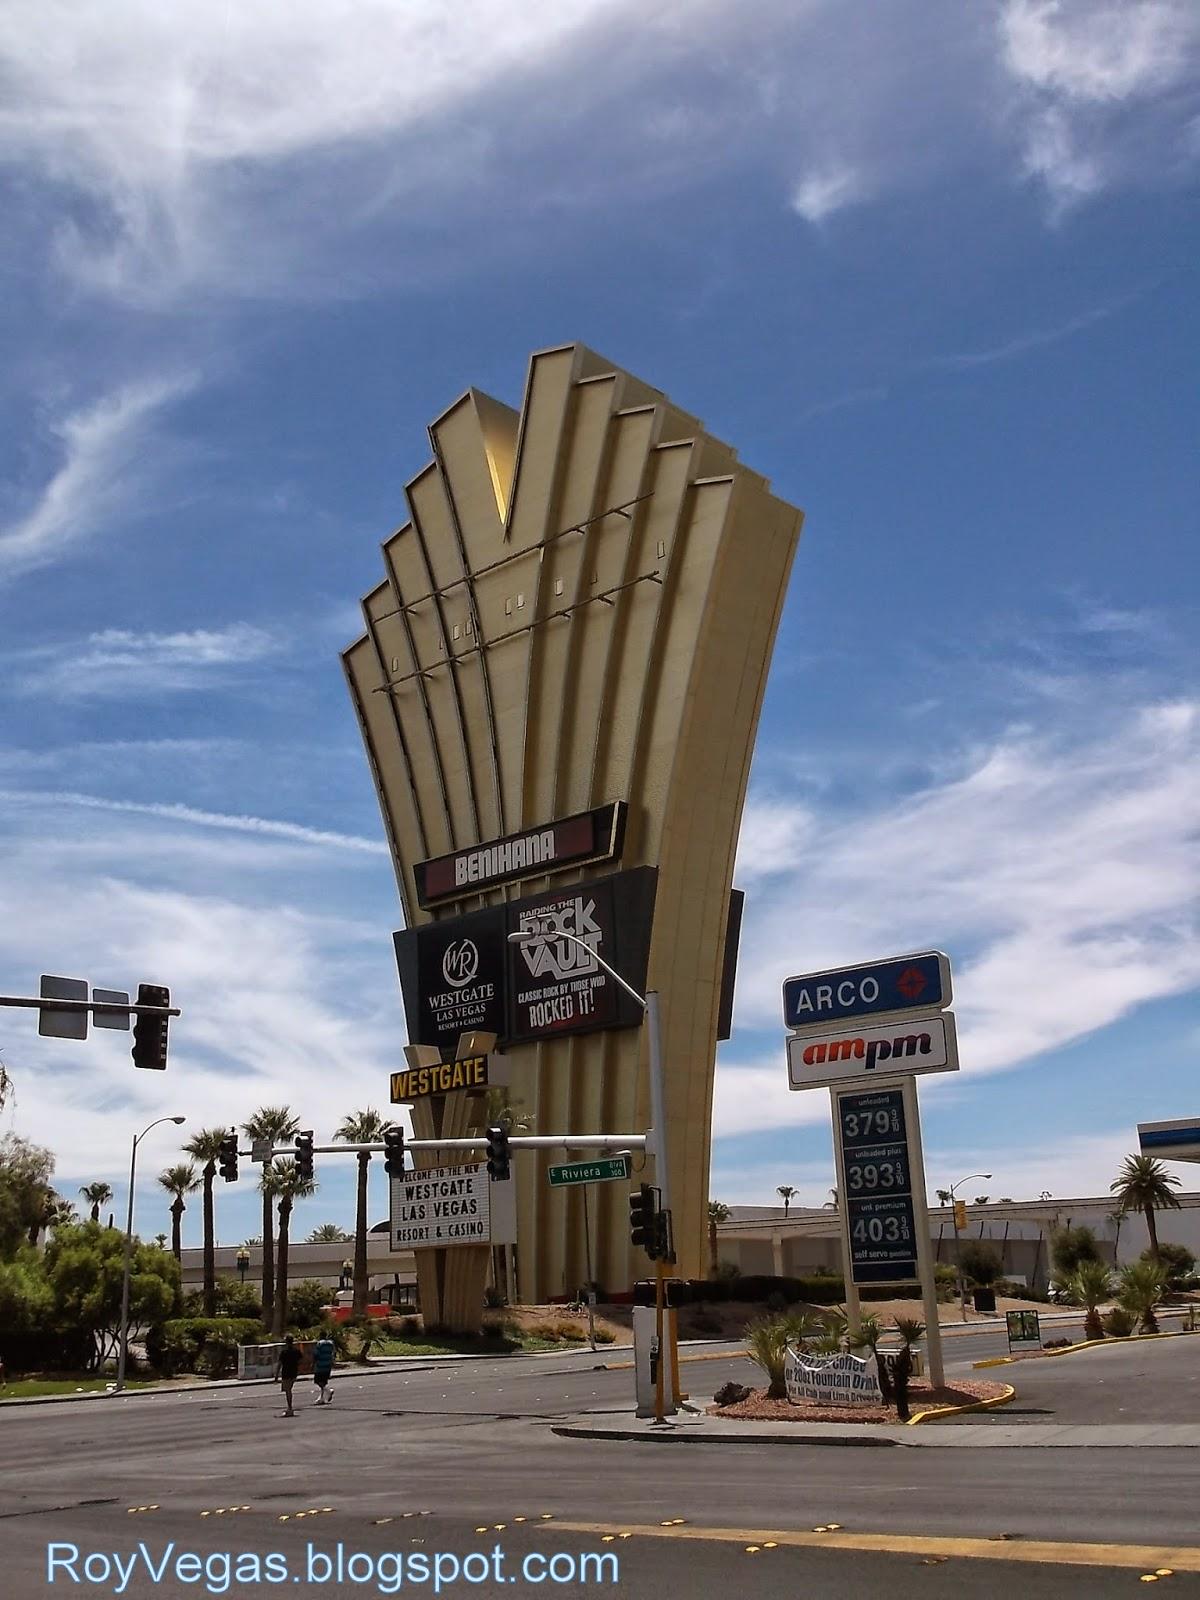 Roy Vegas Westgate LVH Hilton International